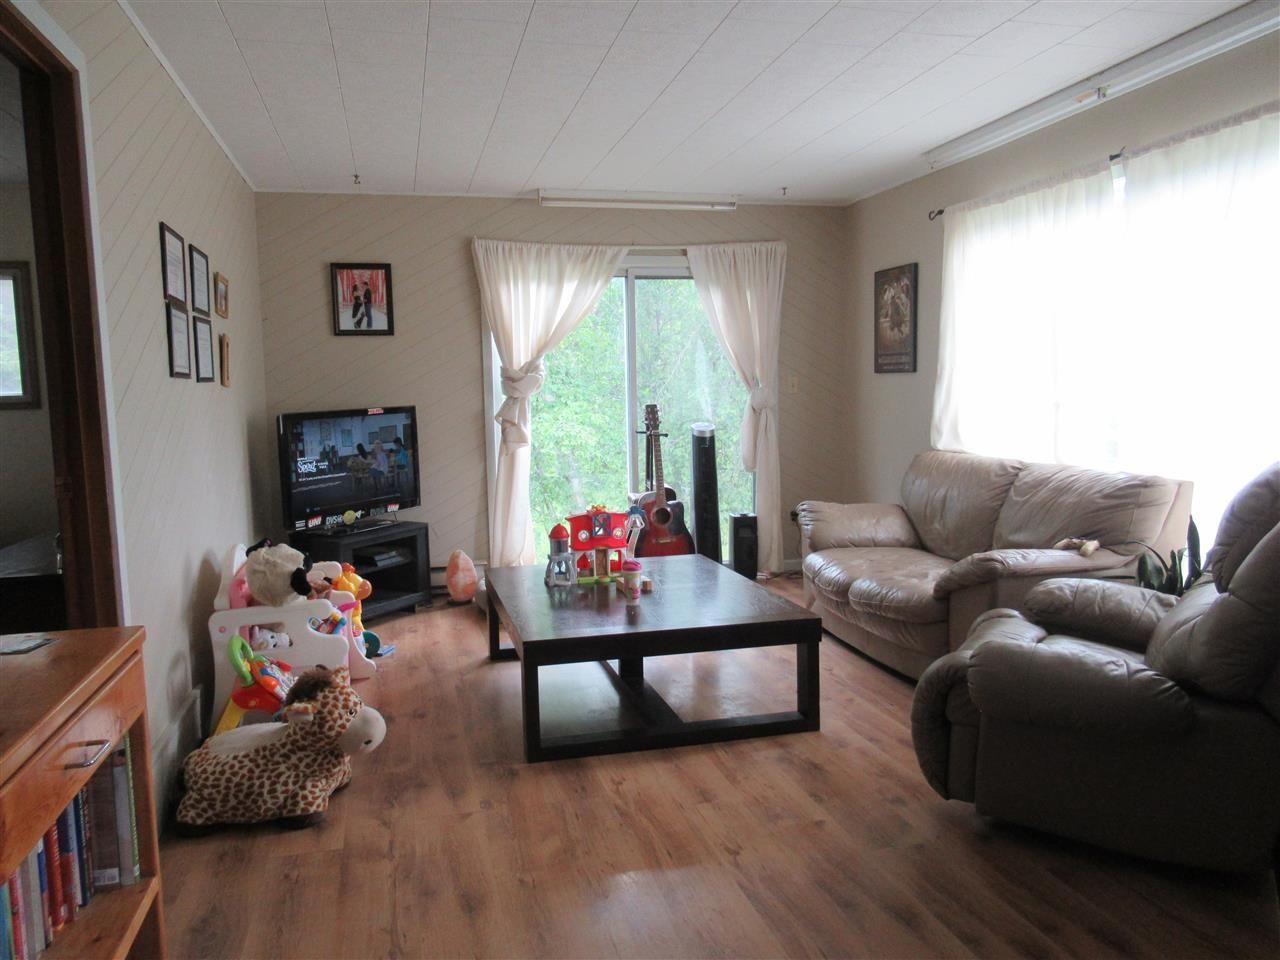 Photo 5: Photos: 950 HODGSON Road in Williams Lake: Esler/Dog Creek House for sale (Williams Lake (Zone 27))  : MLS®# R2383953